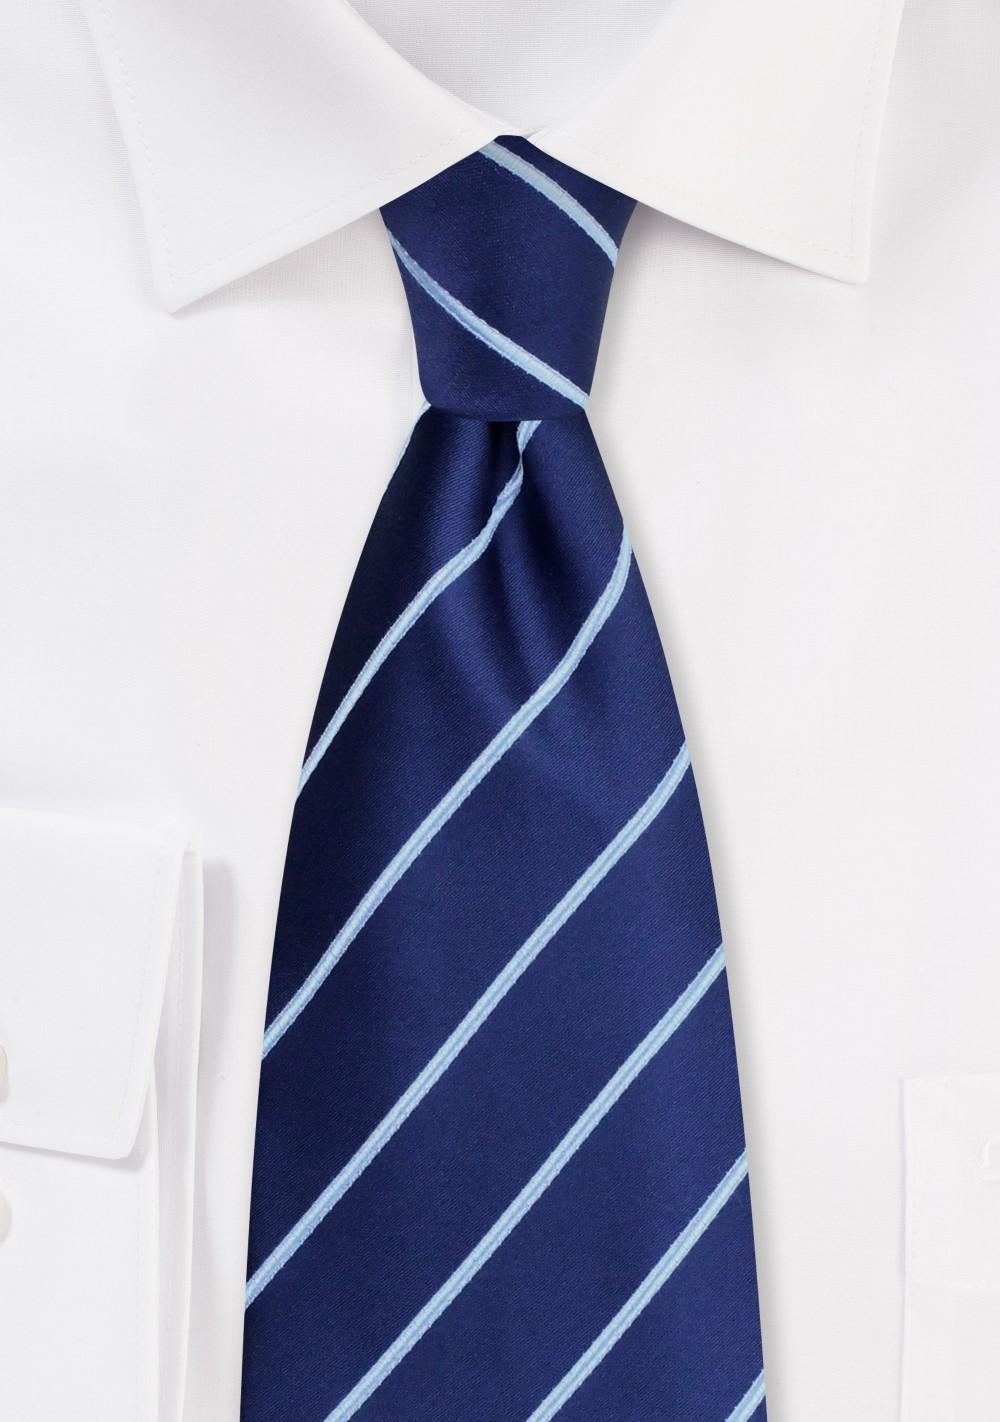 Navy Blue Striped Tie in XL Length